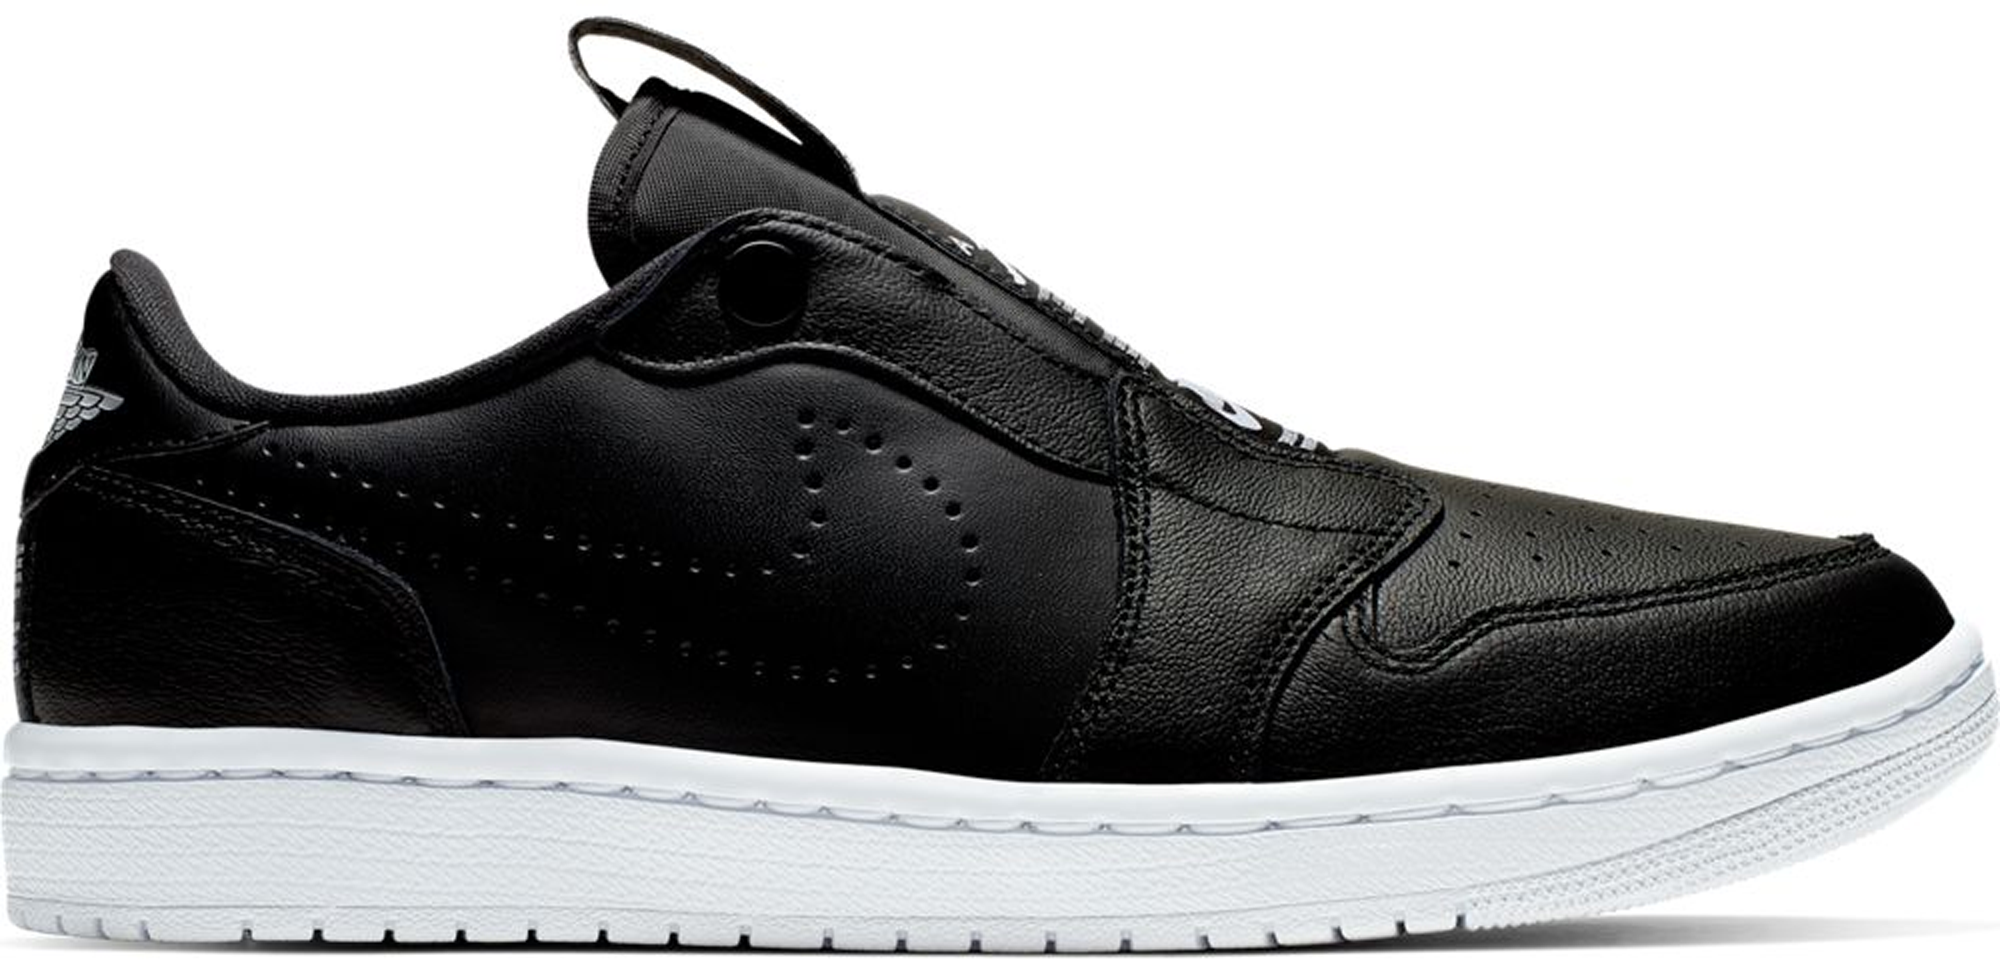 Jordan 1 Retro Low Slip Black White (W